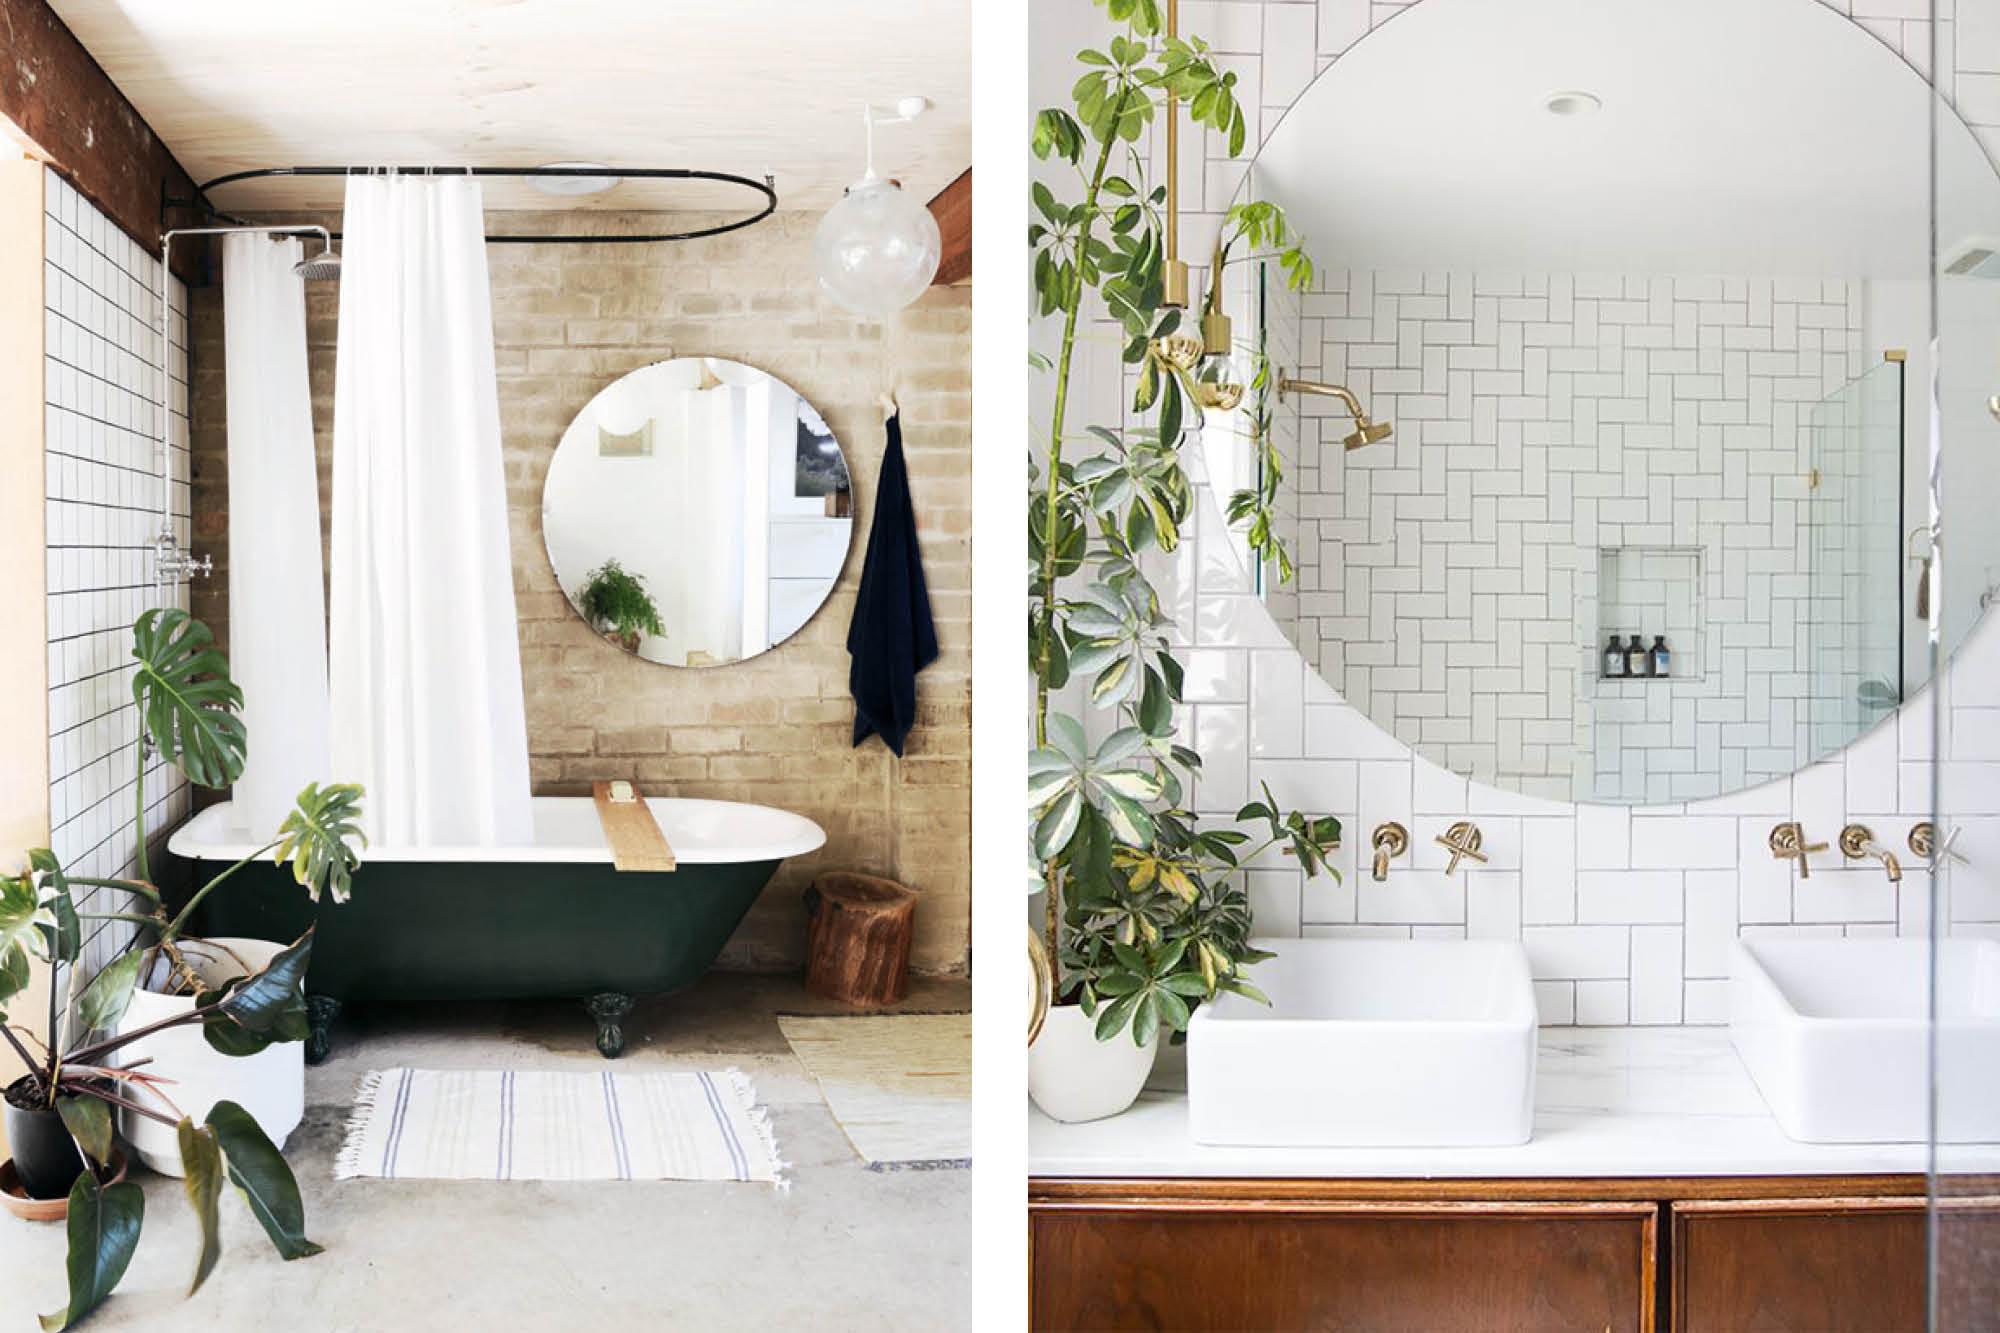 naturnara-badrum-runda-former-gron-trend